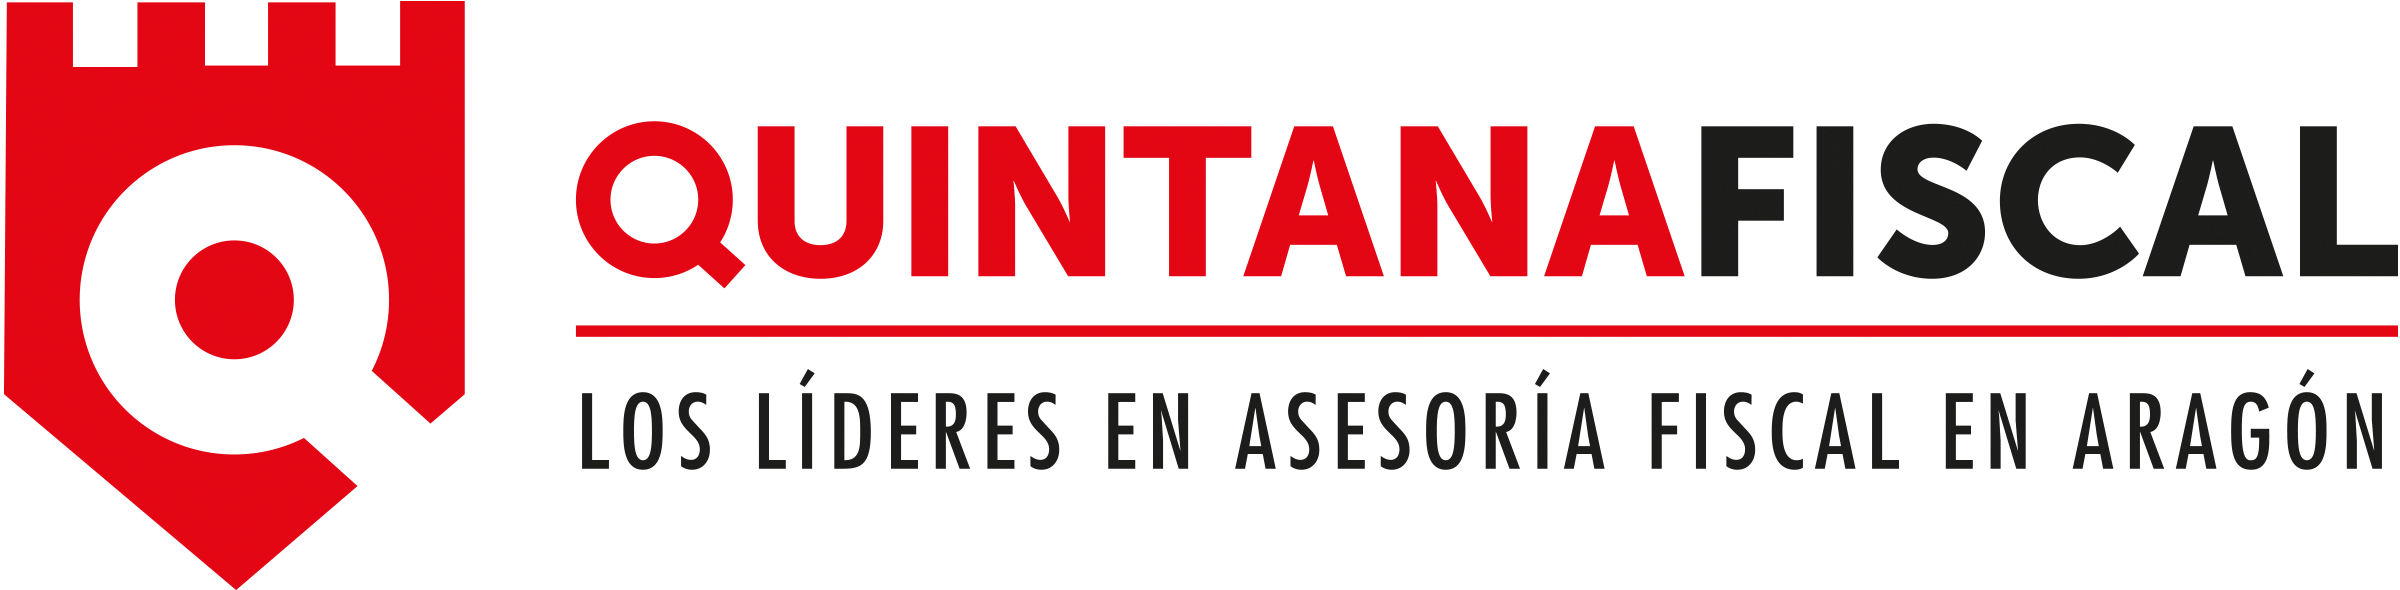 QUINTANA Fiscal. Logo Marca Horizontal. Gran formato. Transparente